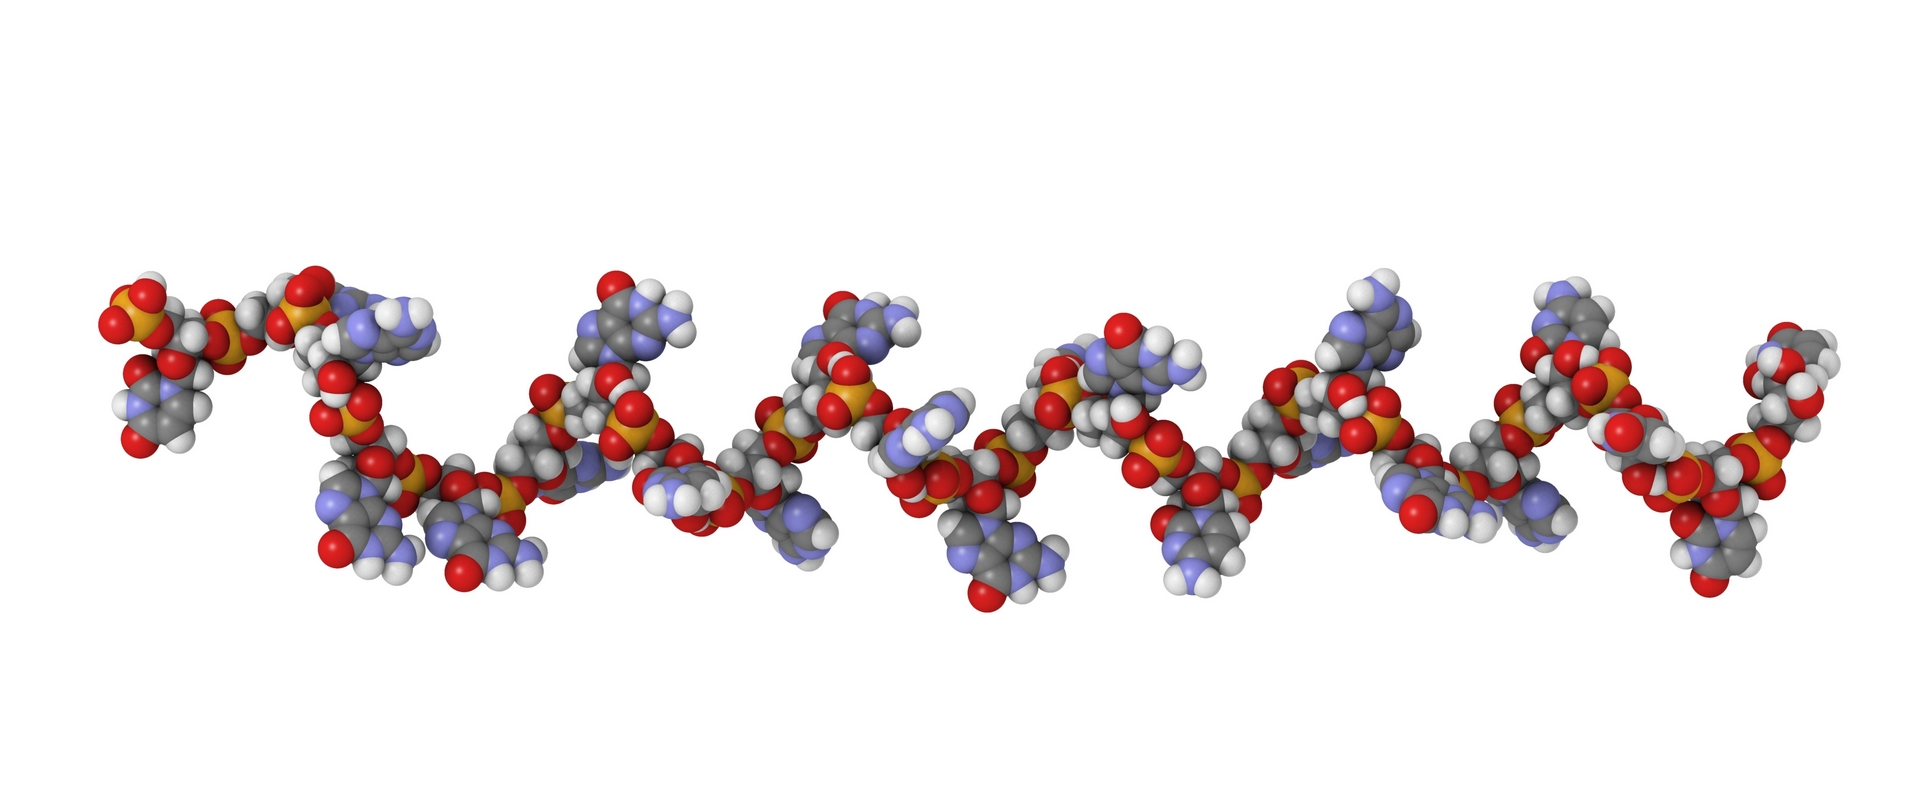 oligonucleotides banner